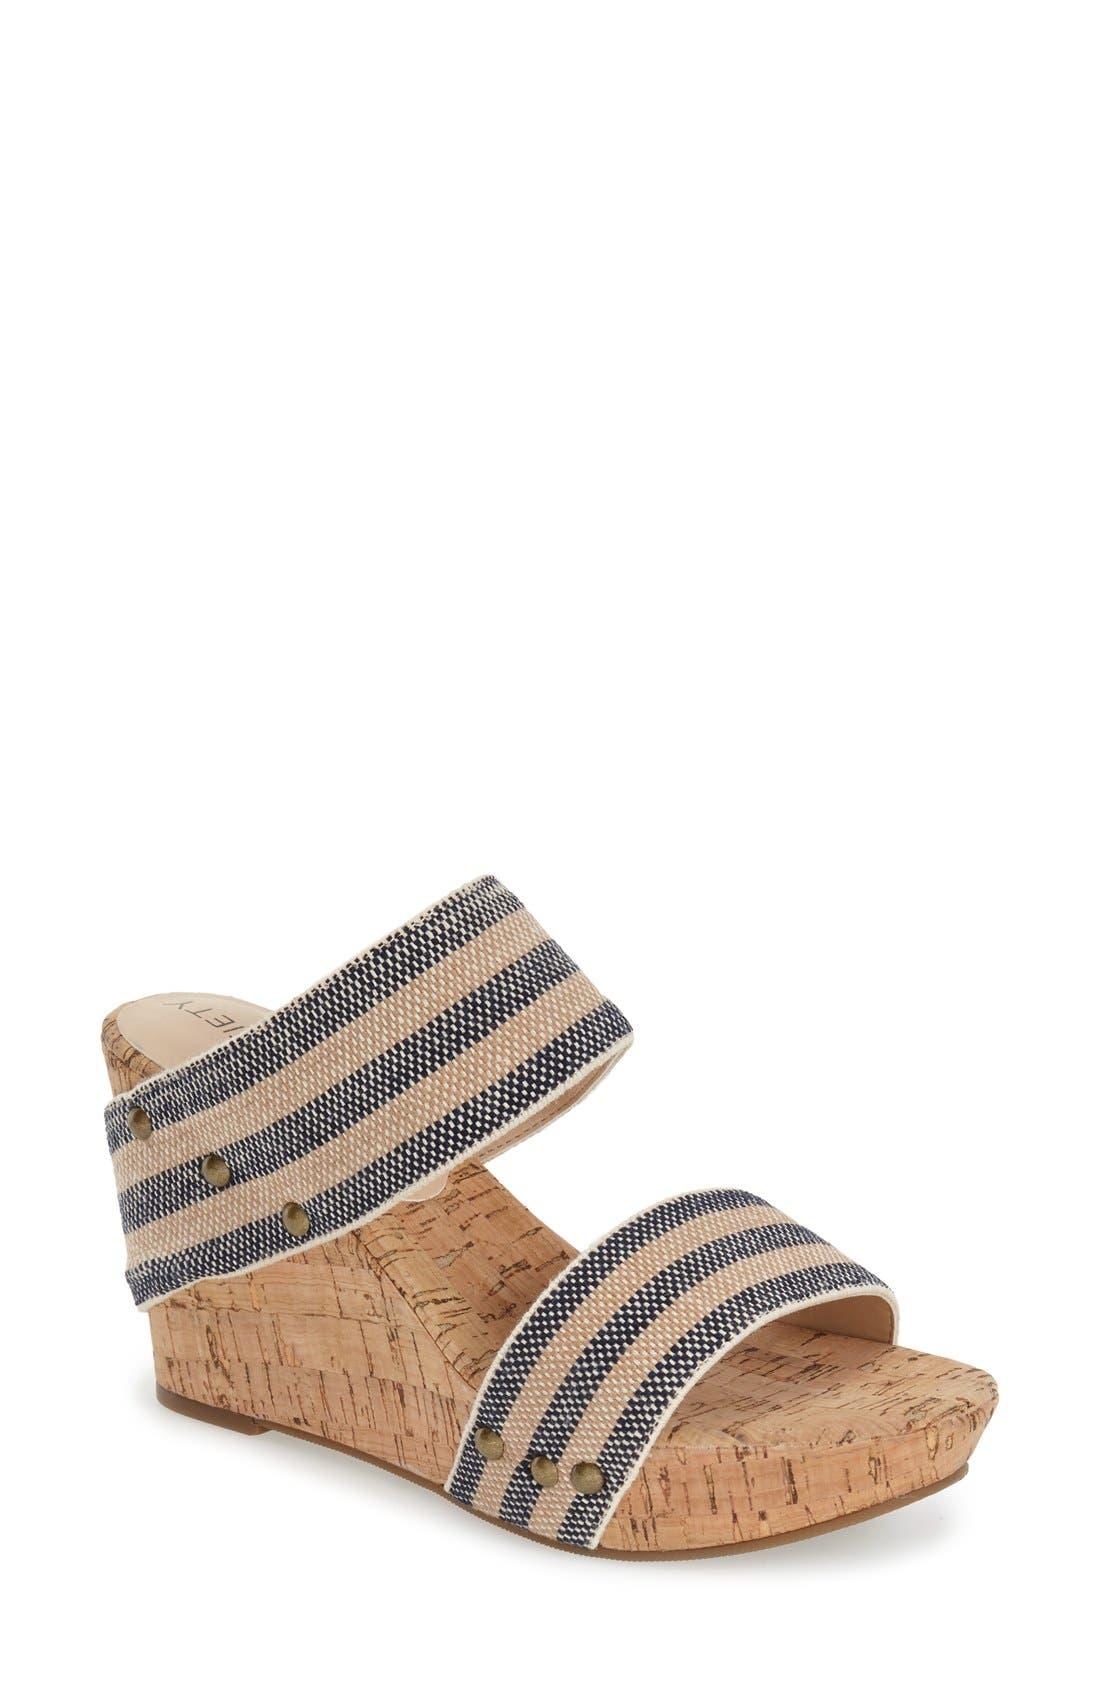 'Emilia 2' Wedge Sandal,                             Main thumbnail 2, color,